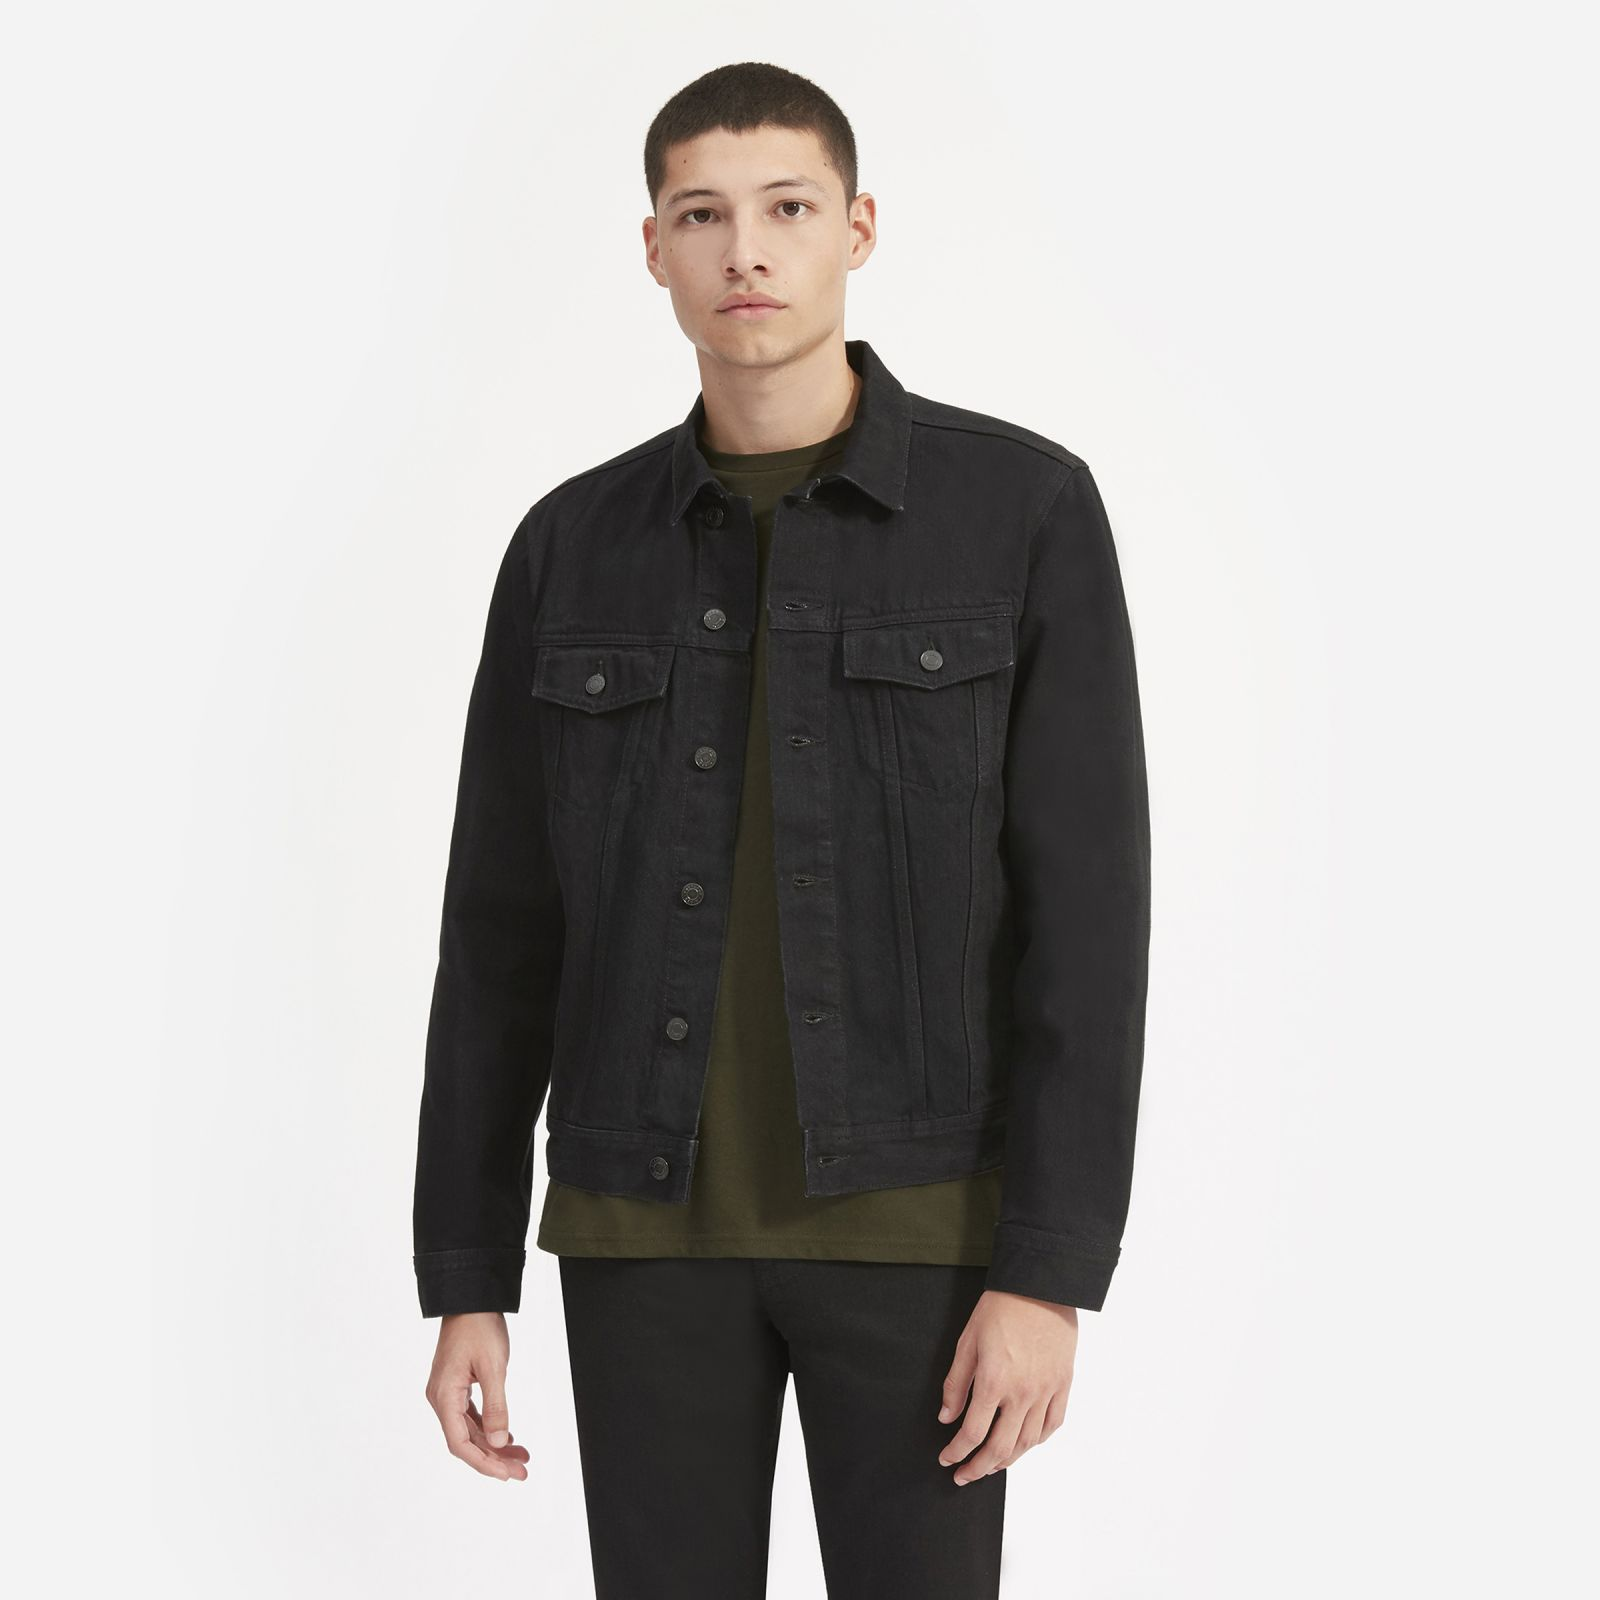 men's denim jacket by everlane in black, size xl